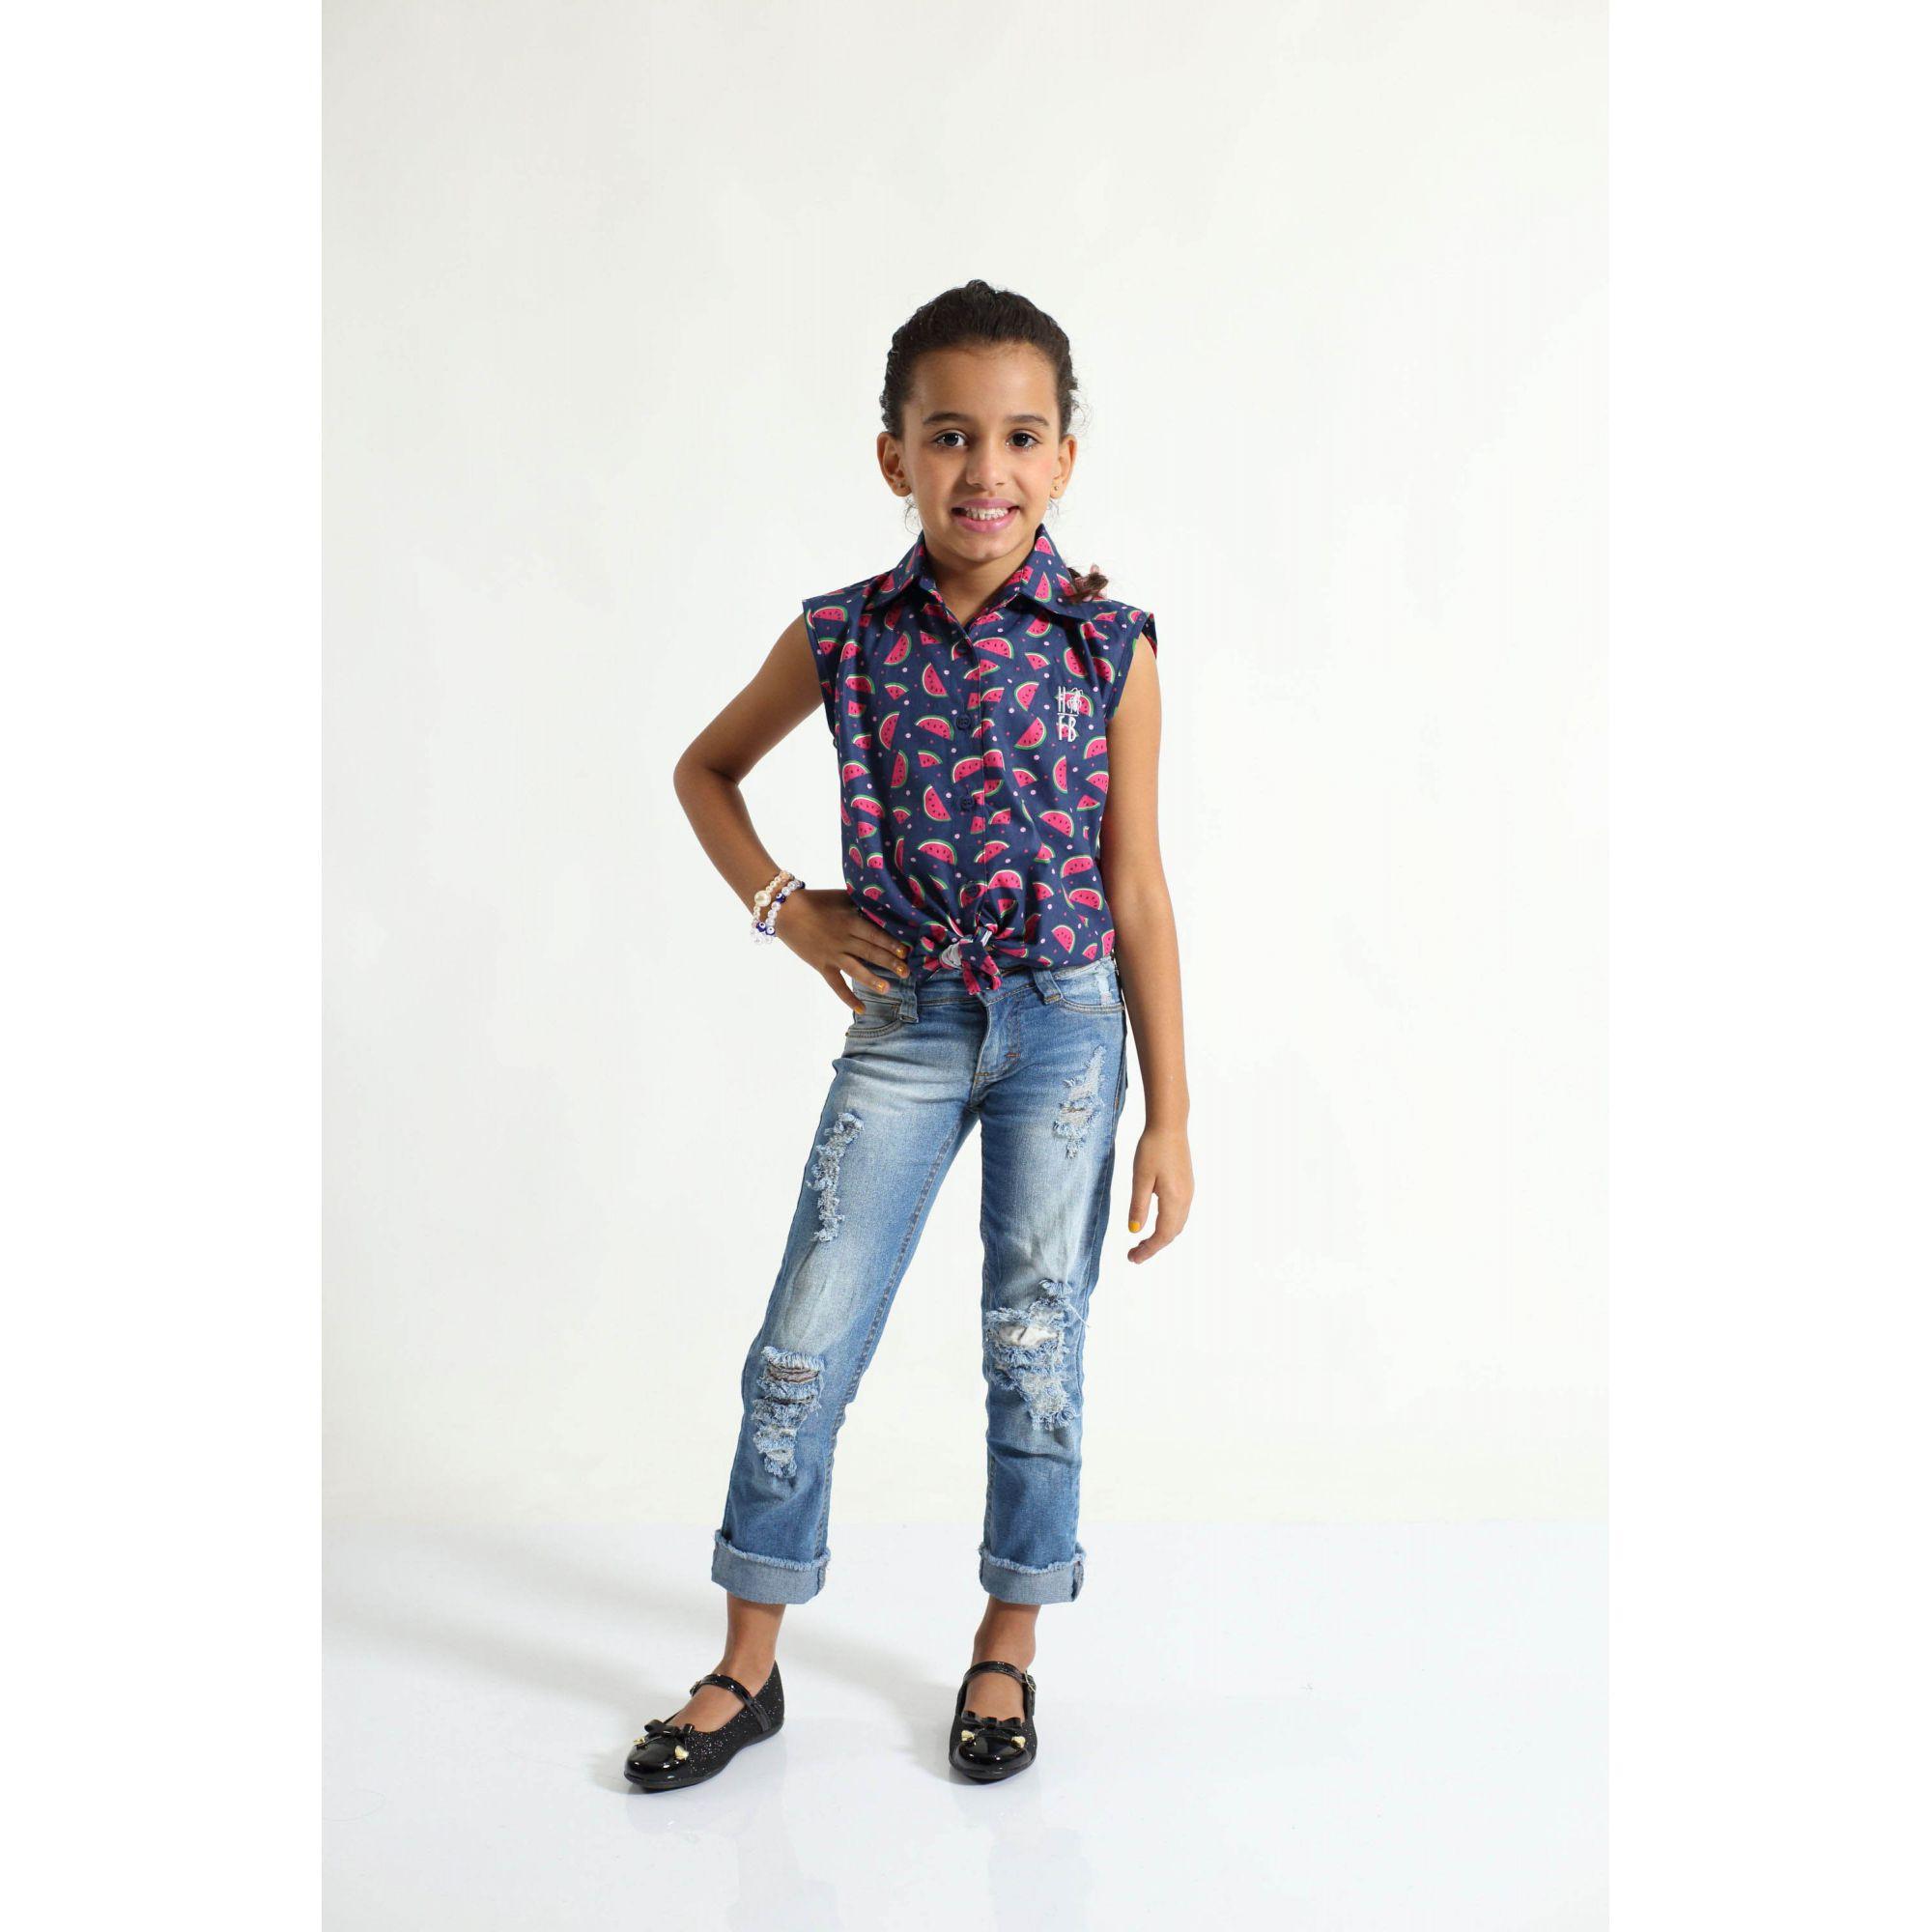 MÃE E FILHA > Kit 02 Camisas Social Adulto e Infantil Melancia [Coleção Tal Mãe Tal Filha]  - Heitor Fashion Brazil